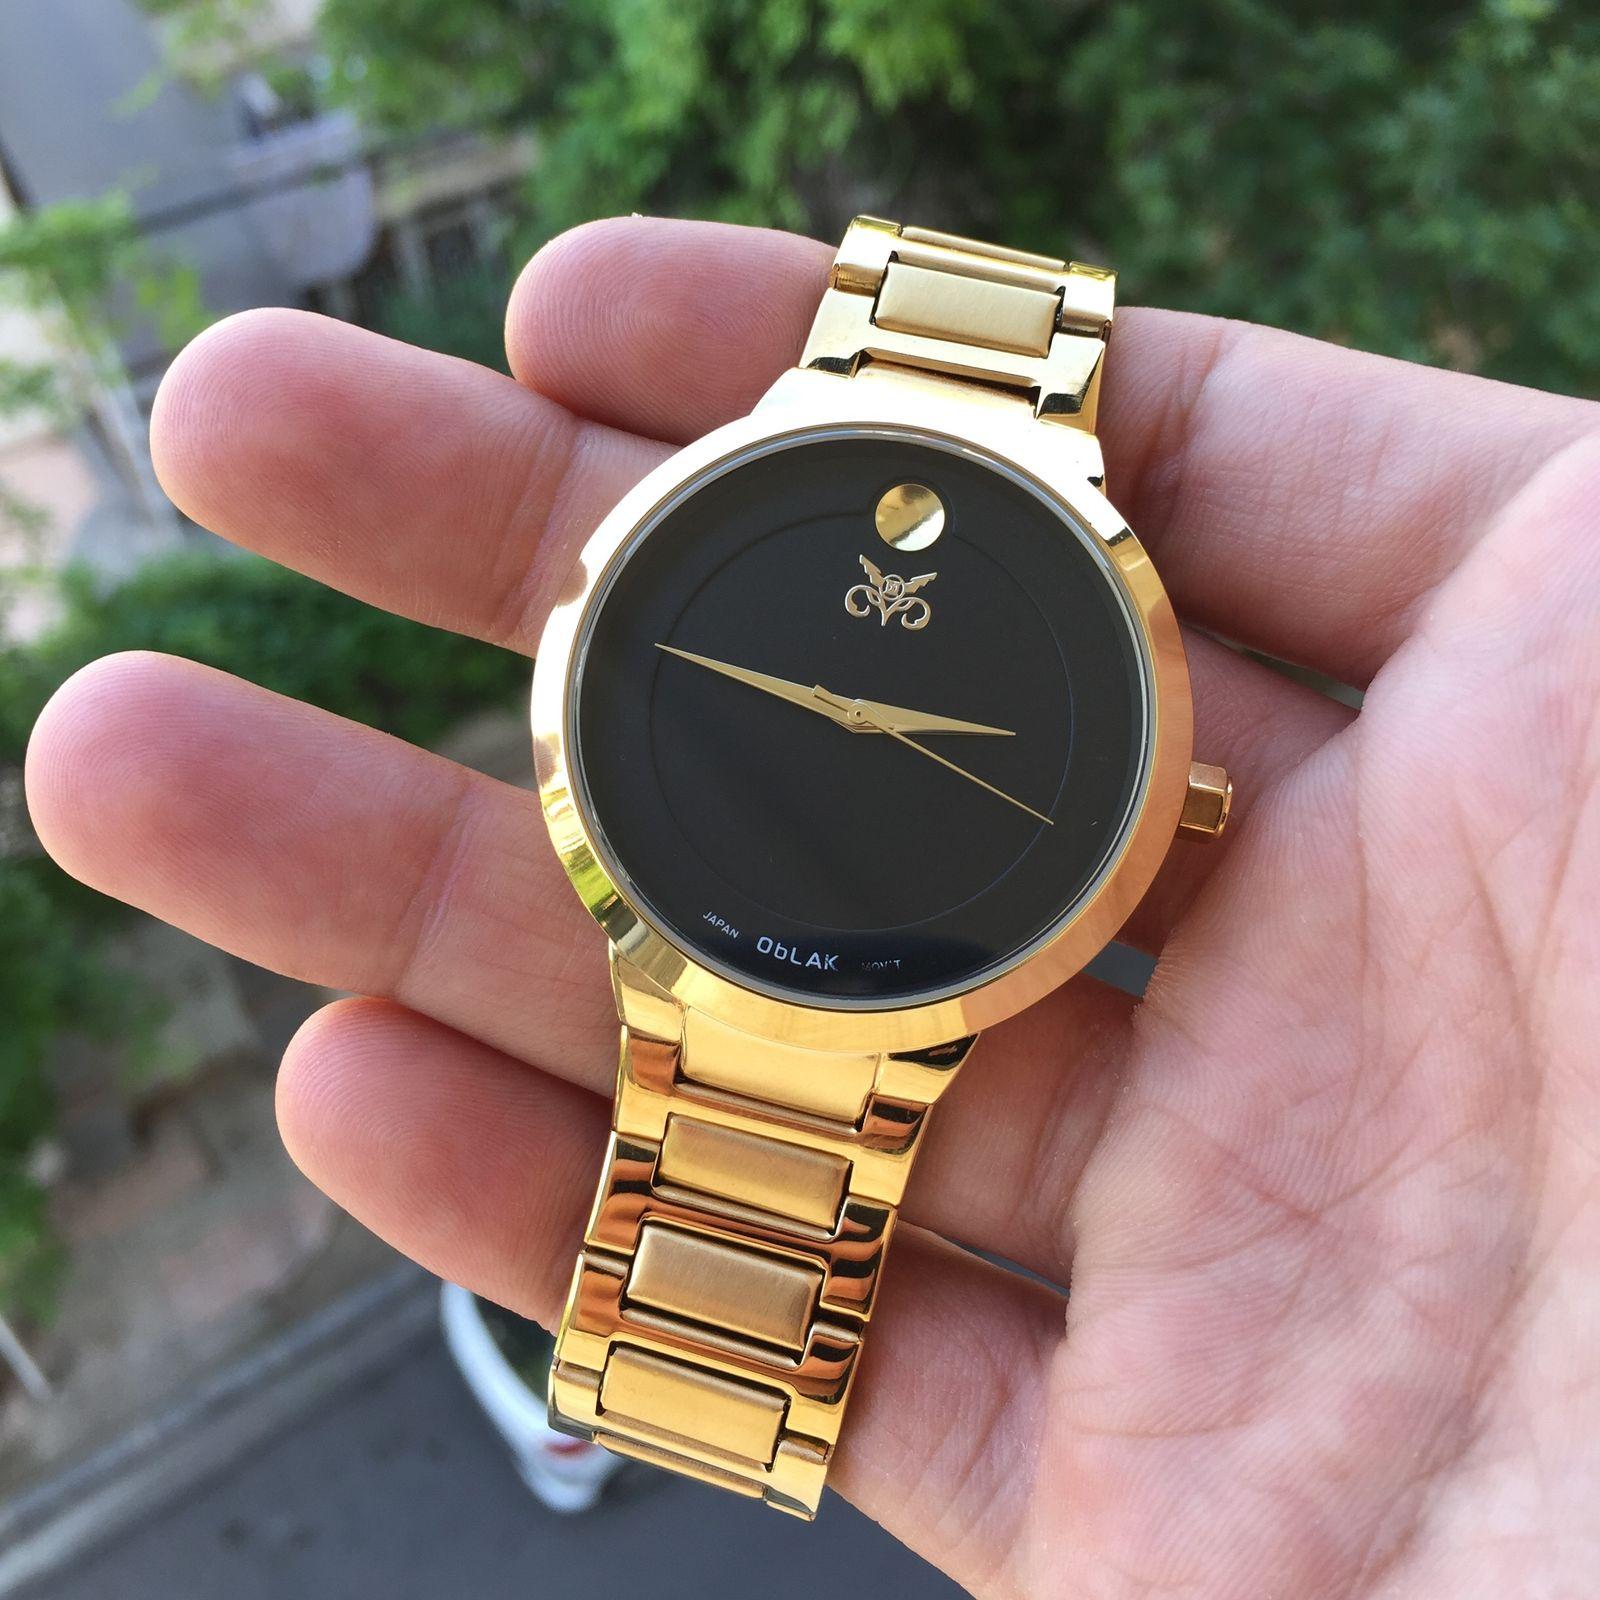 ساعت مچی عقربه ای مردانه اوبلاک مدل 72694 -  - 3